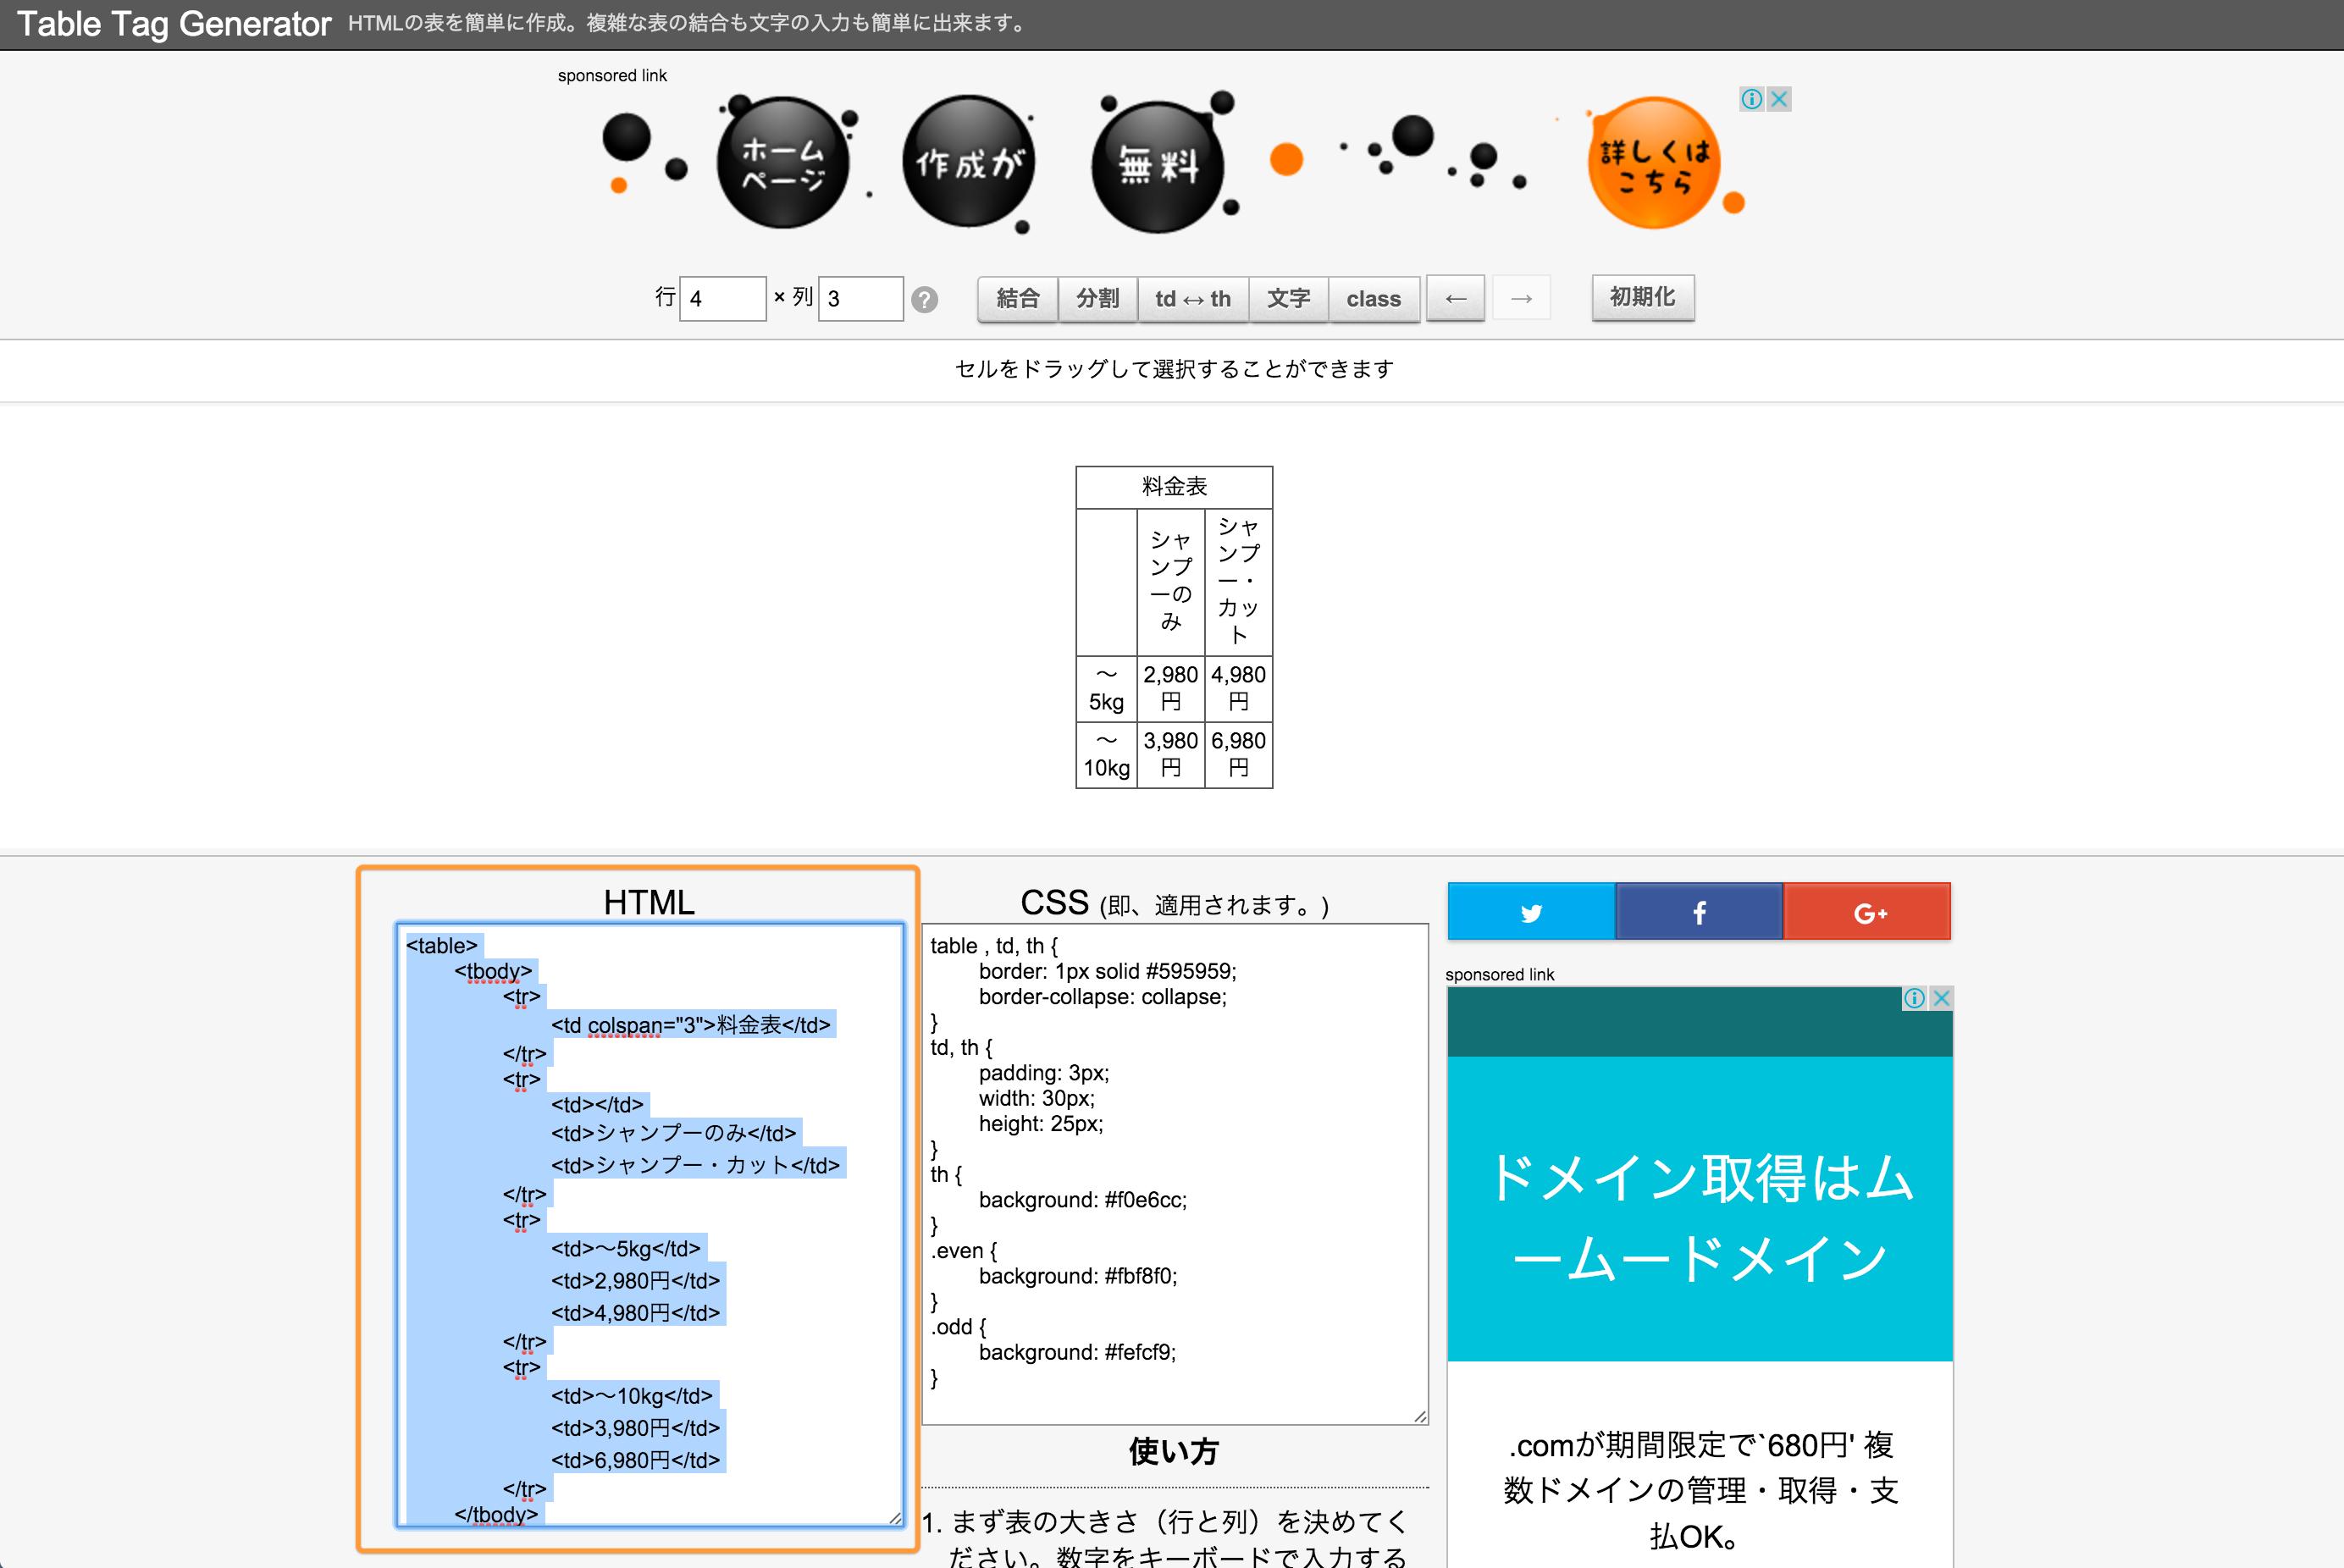 Table Tag Generator | HTMLの表を簡単に作成・結合ツール。テーブルタグジェネレーター